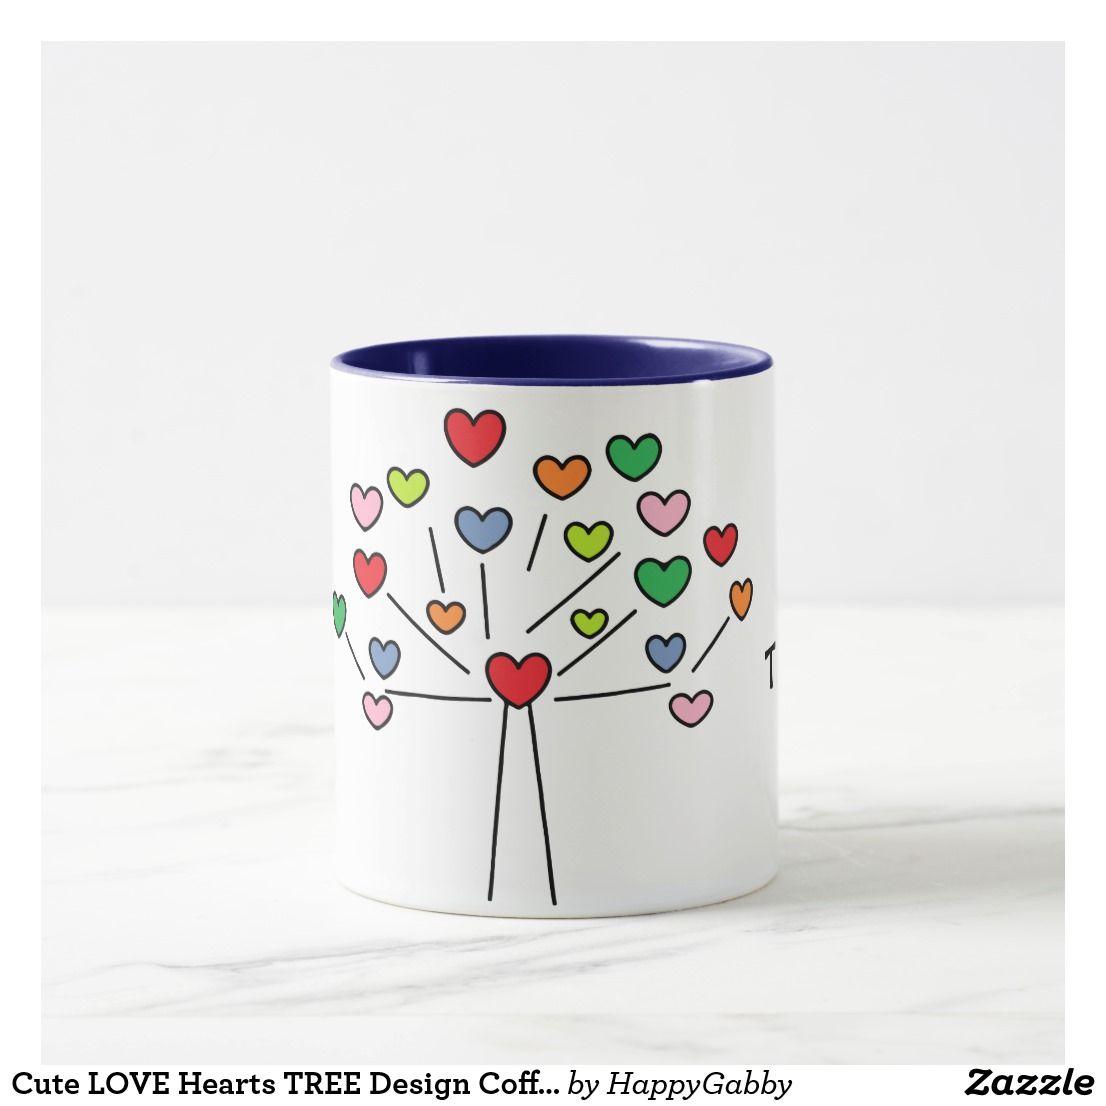 Stupendous Love Hearts Tree Design Coffee Mug Love Hearts Tree Design Coffee Mug Heart Tree Tree Designs Cup Designs furniture Cute Cup Designs